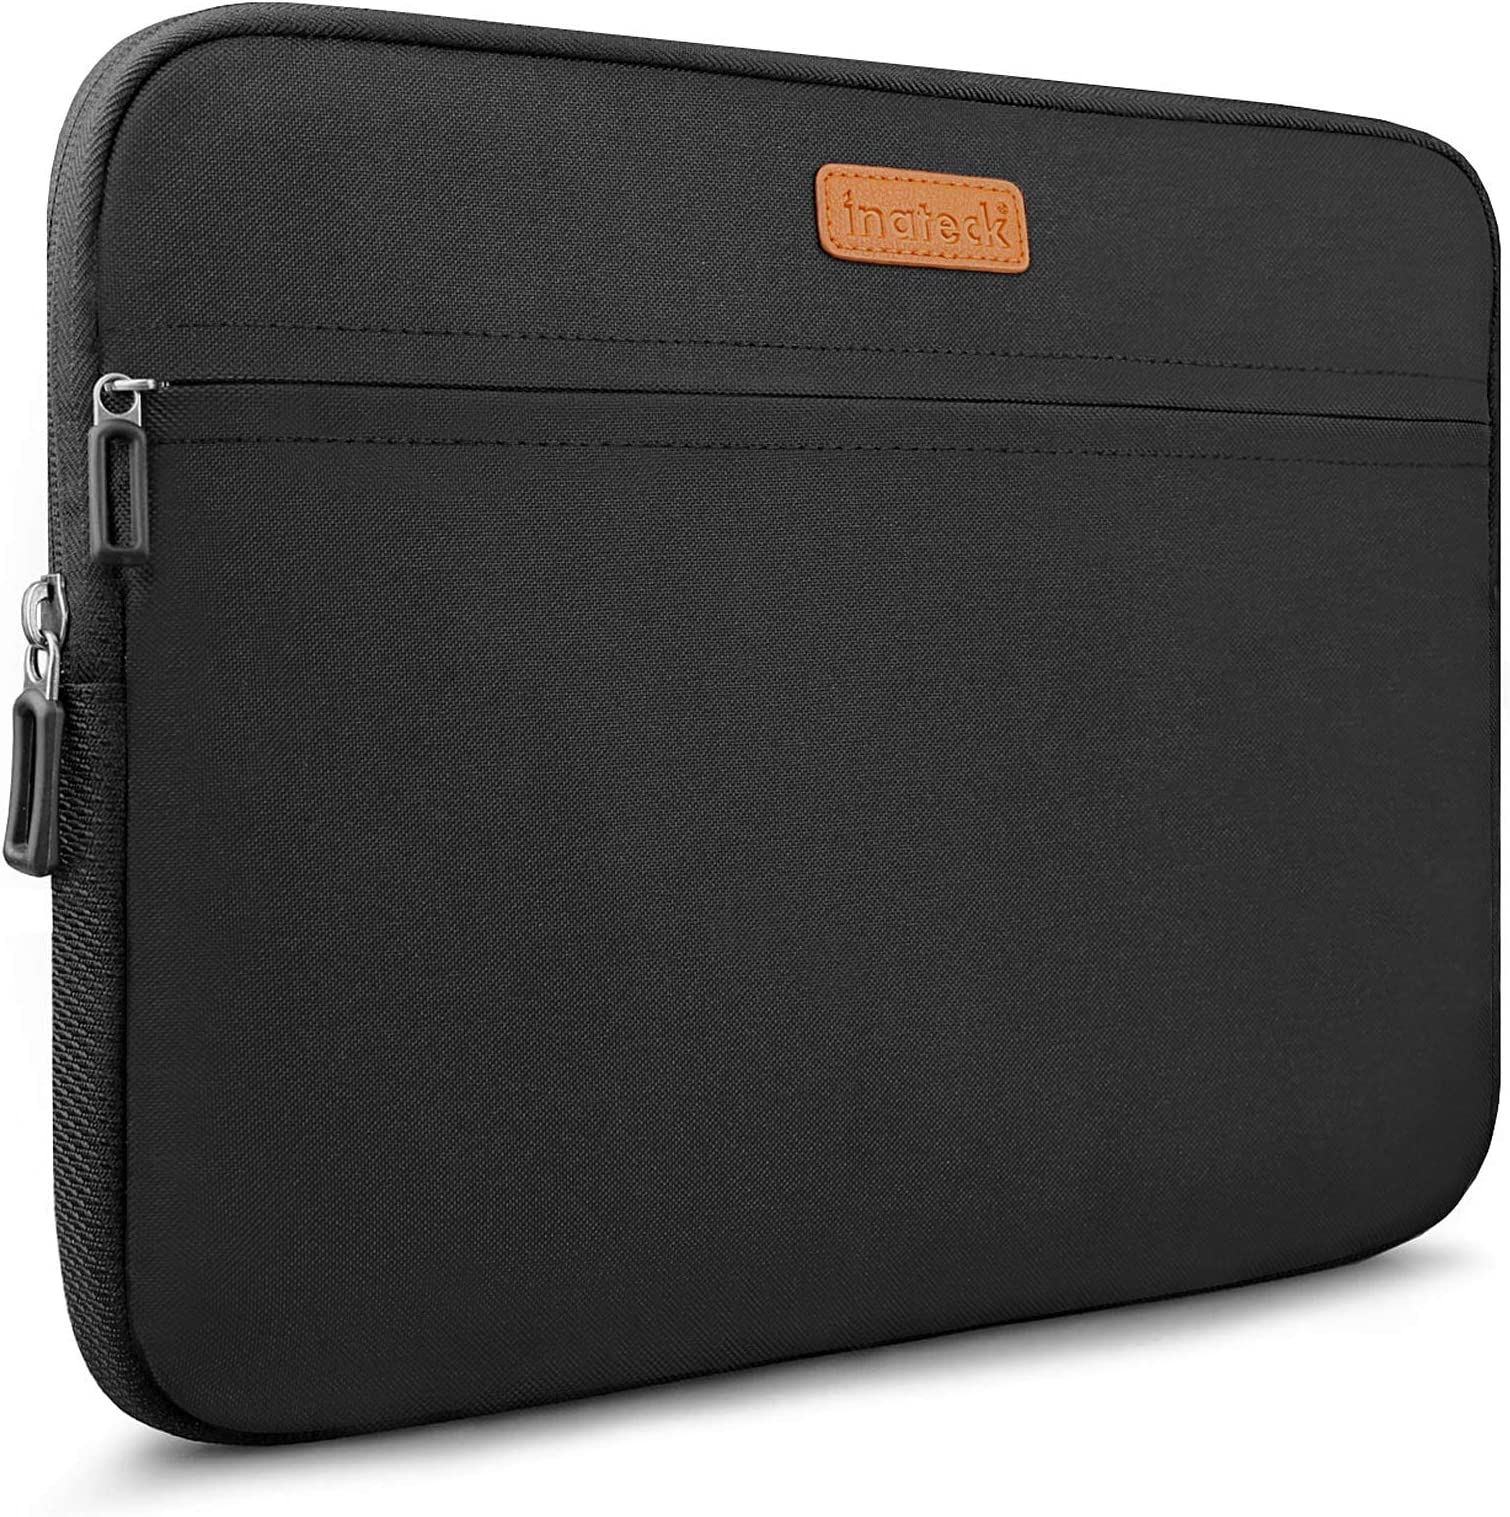 New MacBook Pro 13 Laptop Sleeve for 13 Ultrabooks Padded Laptop Sleeve,Elephant Air or Retina Display 13 MacBook Air Case